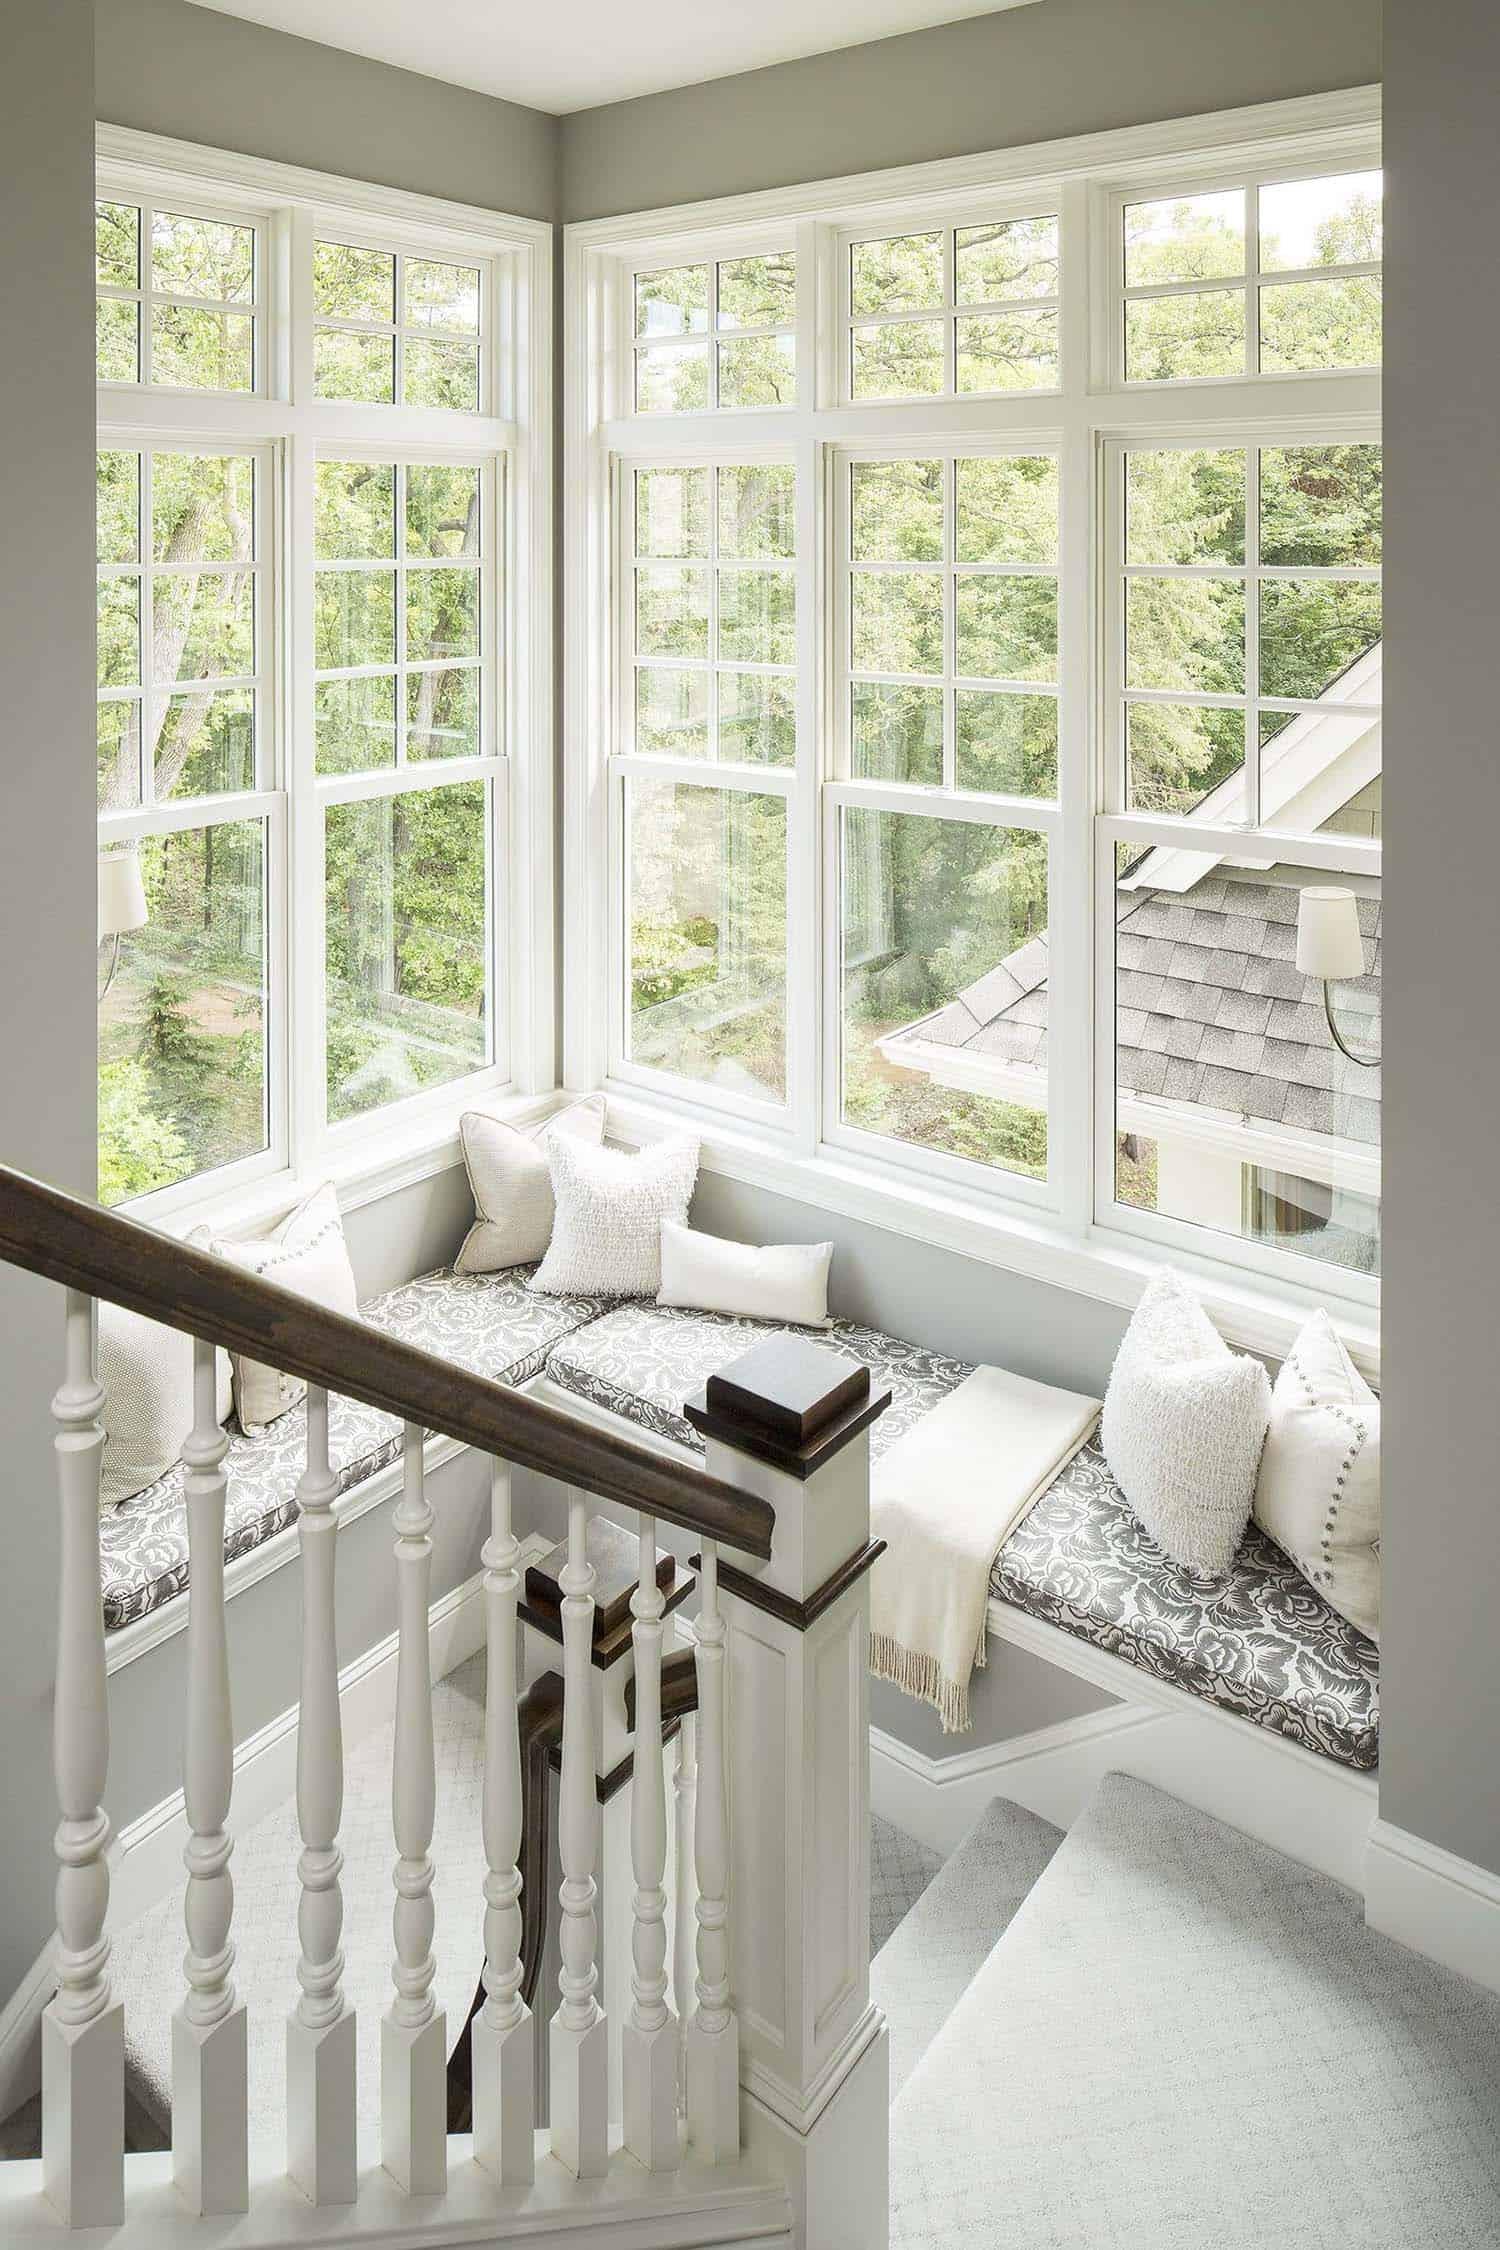 window-nook-ideas-stair-landing-window-seat